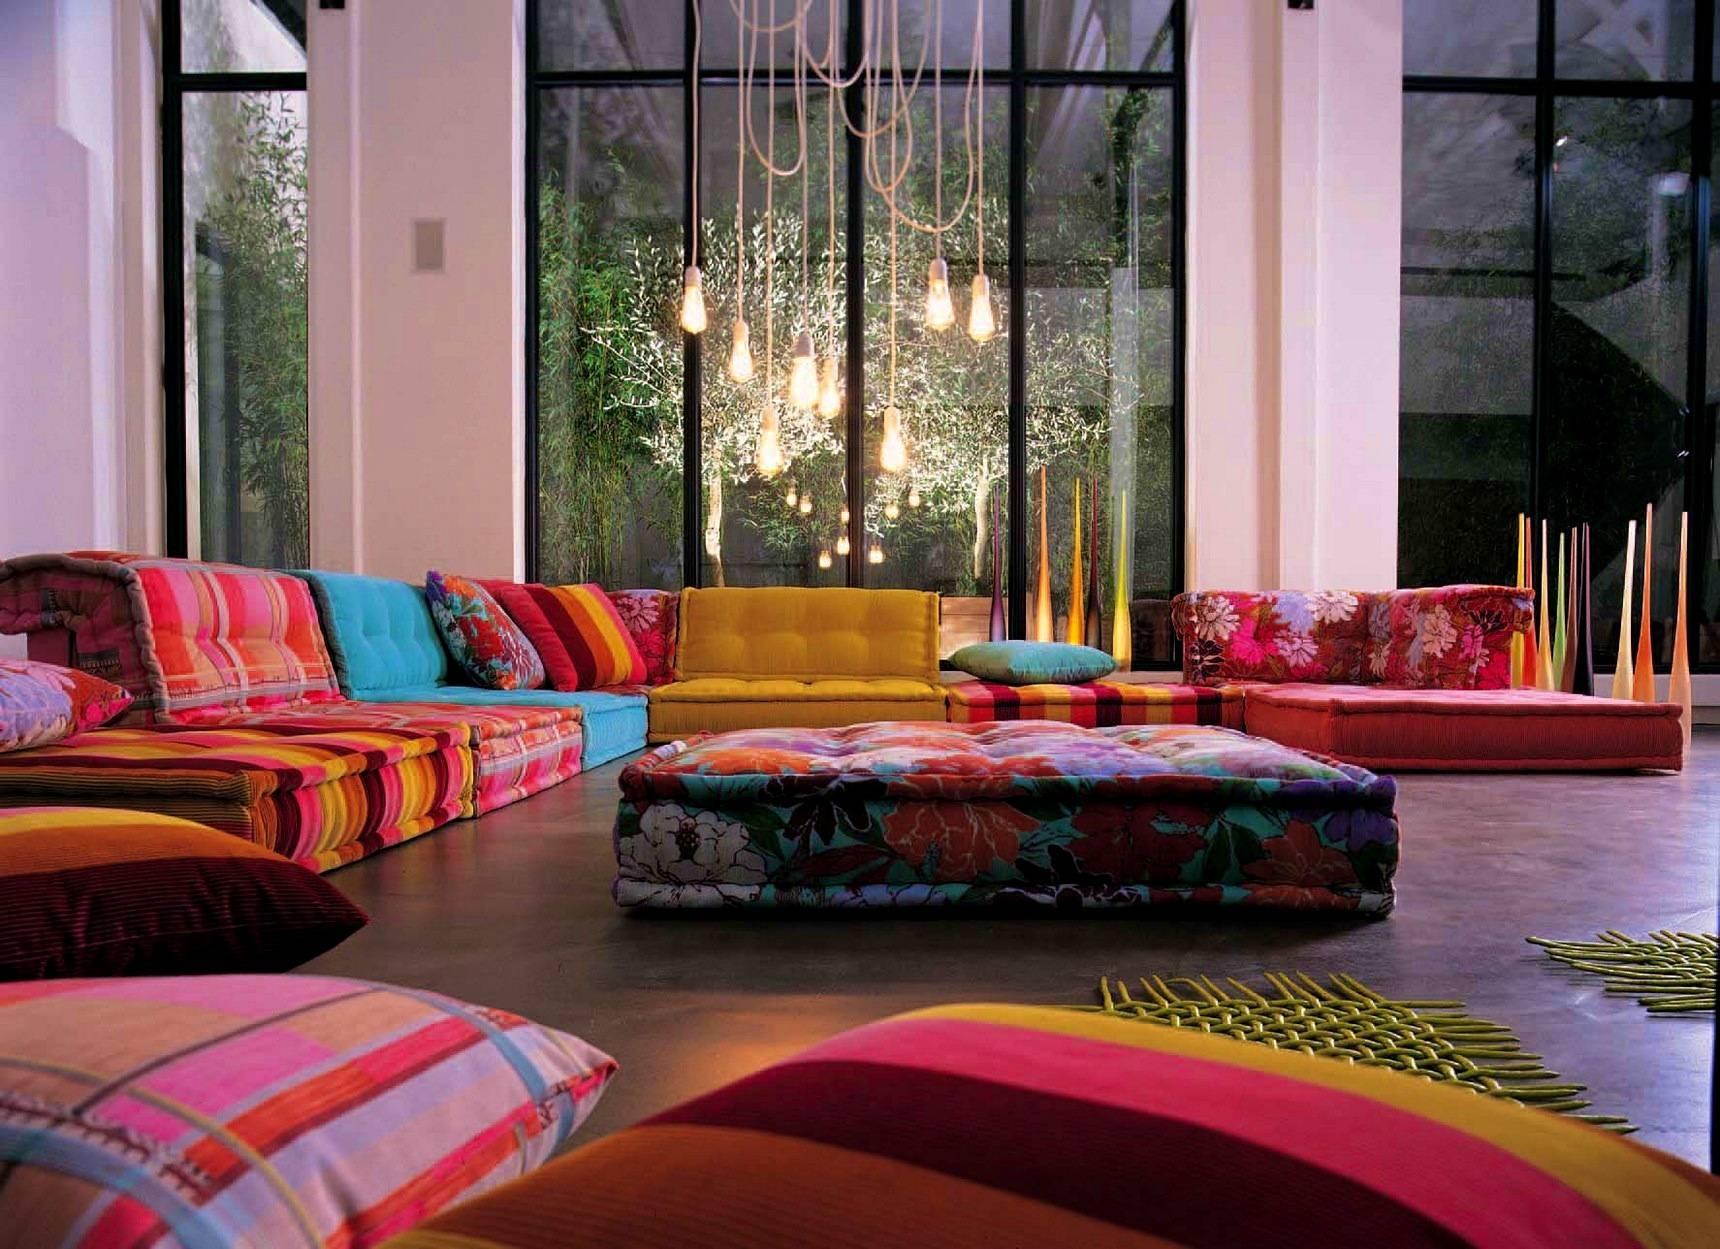 Bedroom : Delightful Floor Couch Cushions Throw Pillow Sofa inside Floor Couch Cushions (Image 3 of 30)